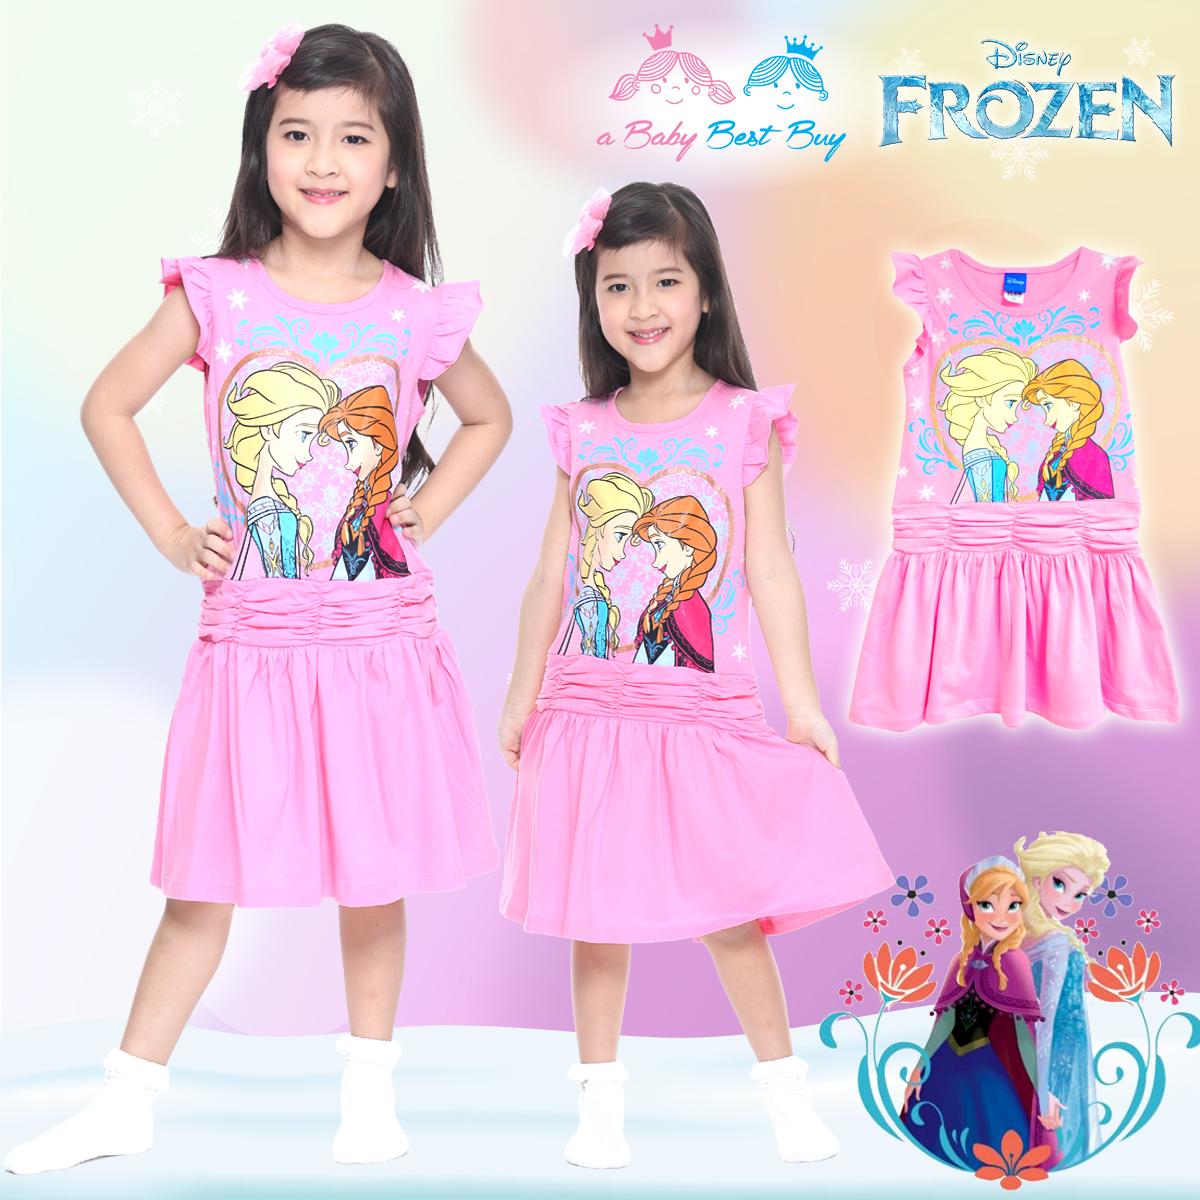 ' (Size 4-6-8-10) ชุดเดรส Disney Frozen ชุดเดรสสีชมพู แขนกุด ลายเจ้าหญิงโฟรเซ่น ดิสนีย์แท้ ลิขสิทธิ์แท้